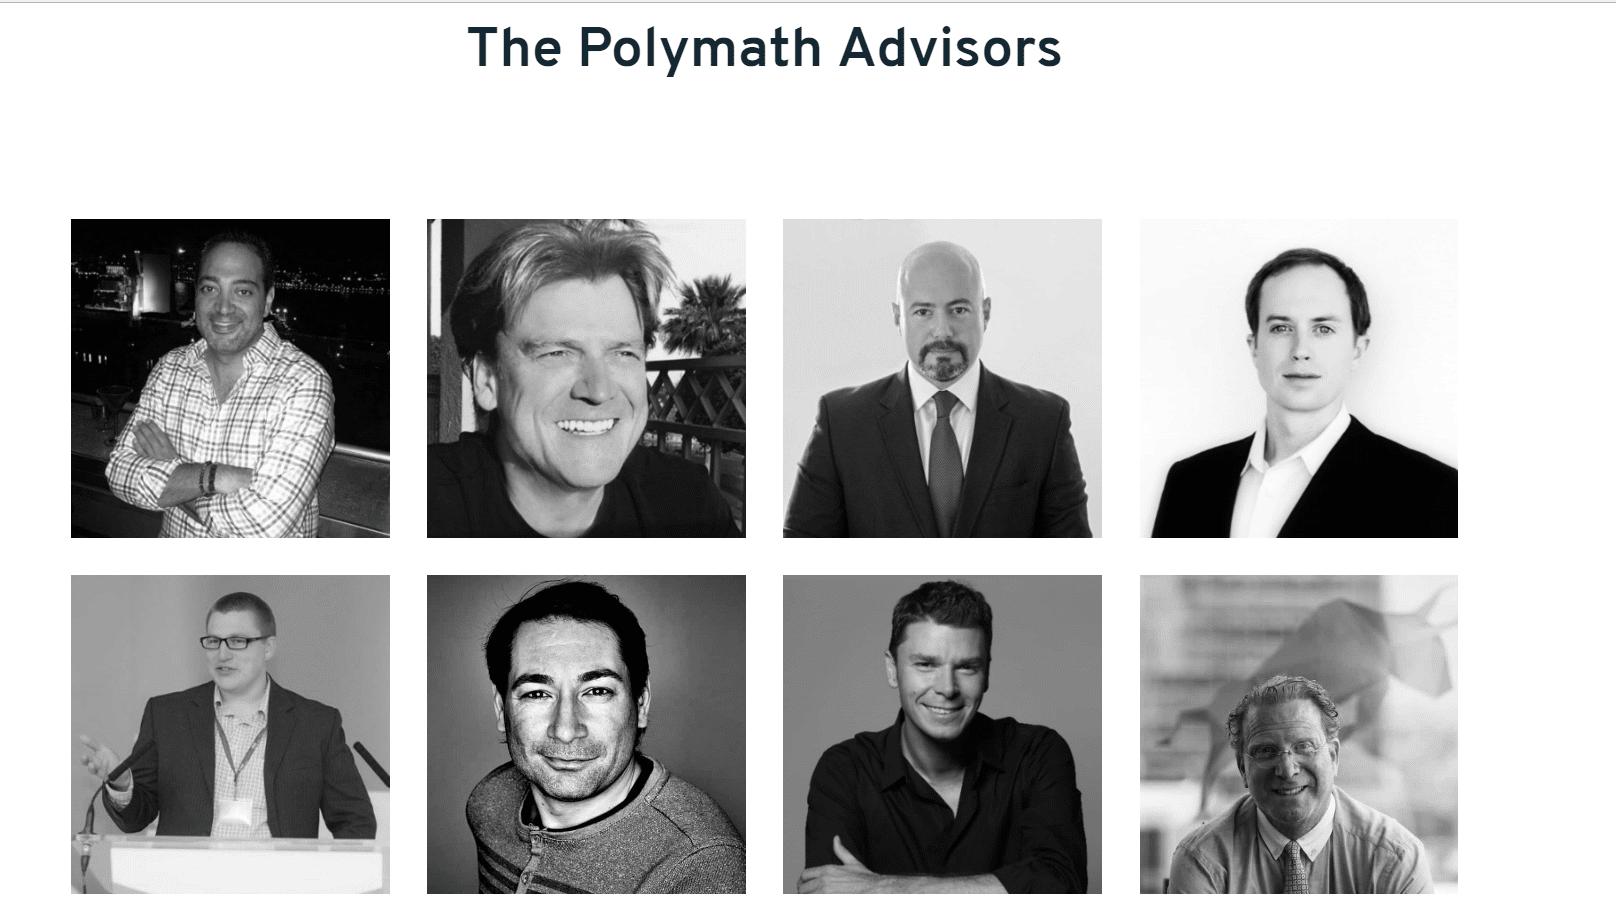 Polymath Advisors